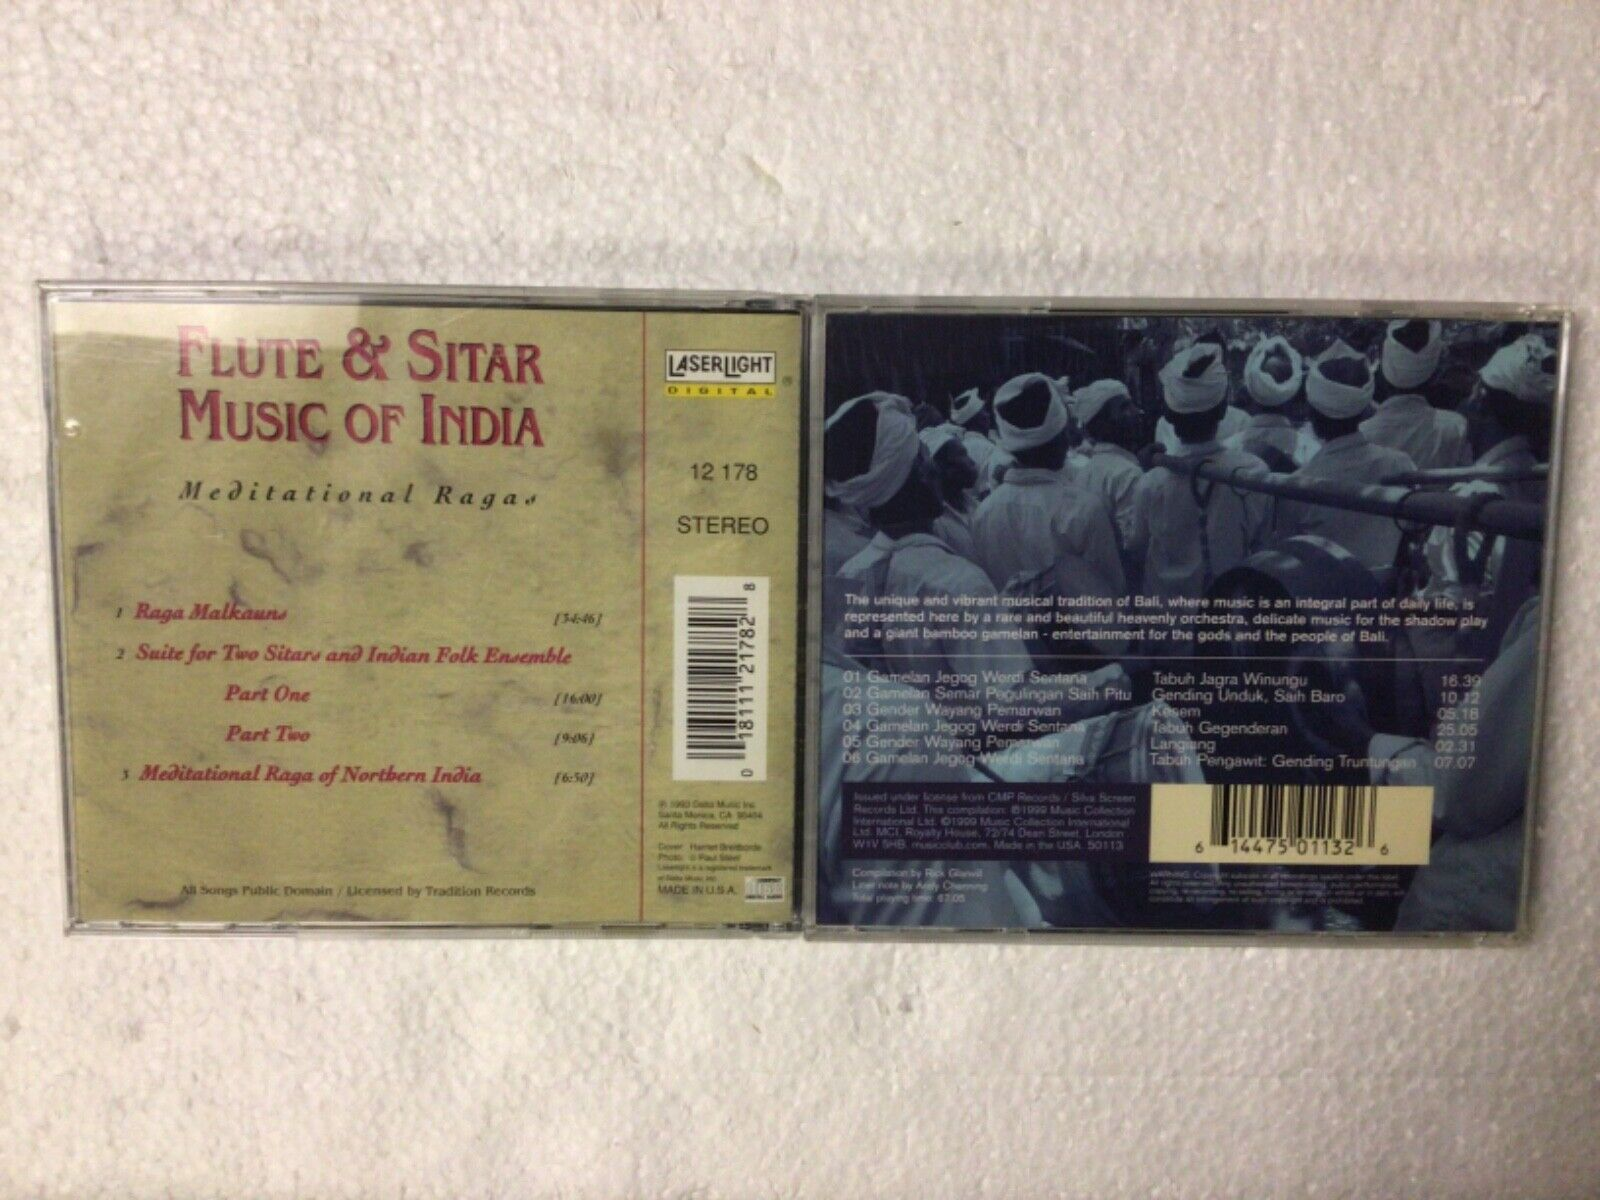 WORLD MUSIC 2 CD LOT - FLUTE AND SITAR MUSIC OF INDIA GAMELAN MUSIC OF BALI - $7.99